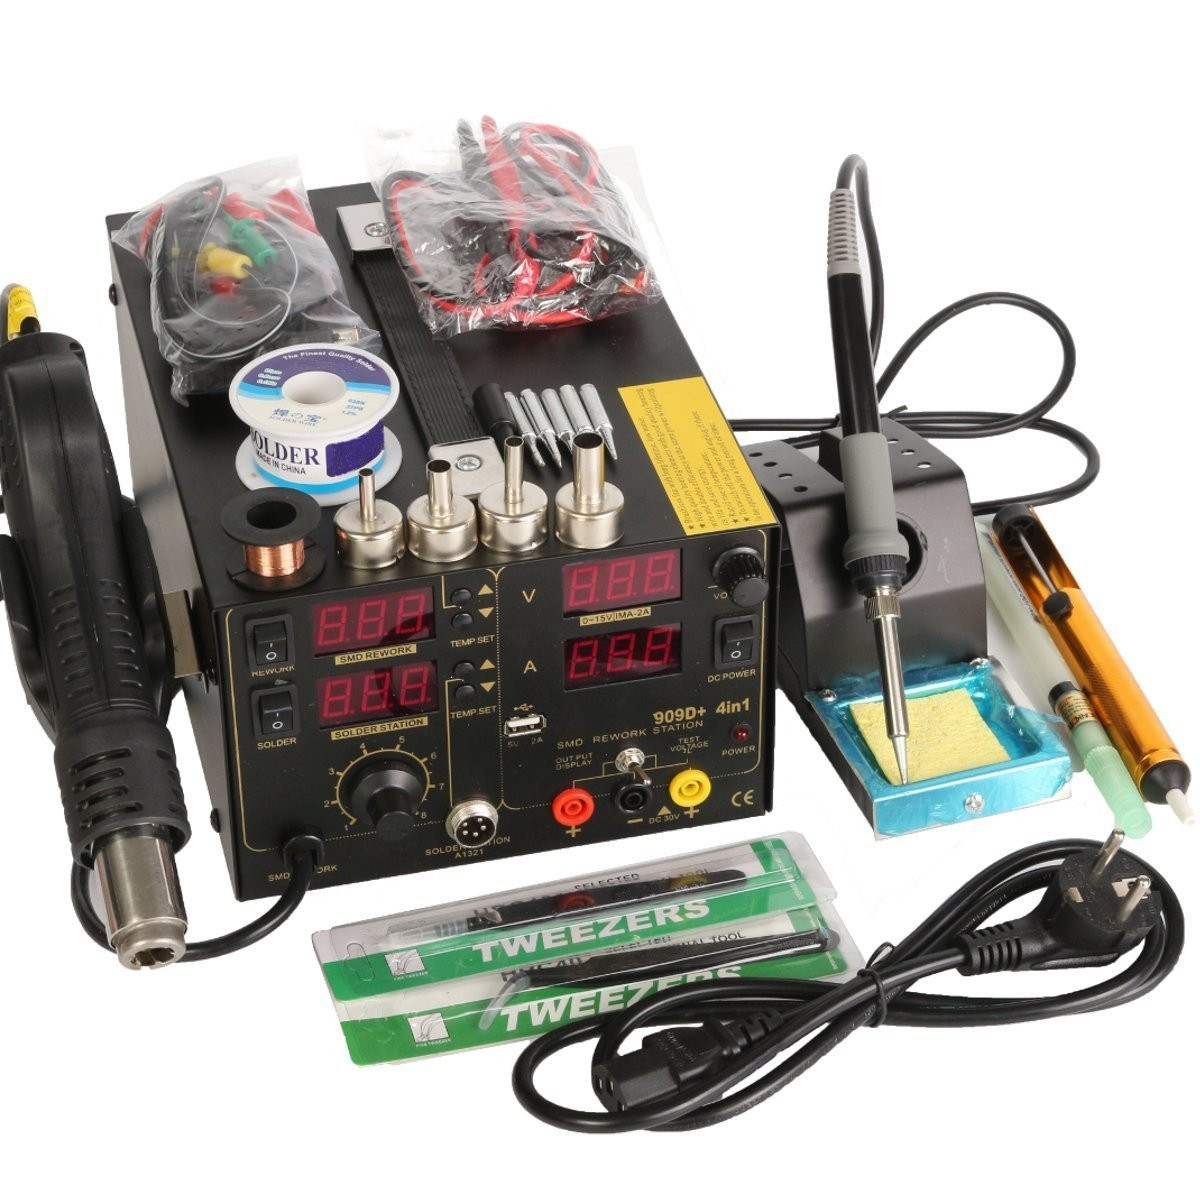 4 In1 Rework Soldering Station Hot Heat Air Gun USB Power Supply 220V AC 800W 909D+ by